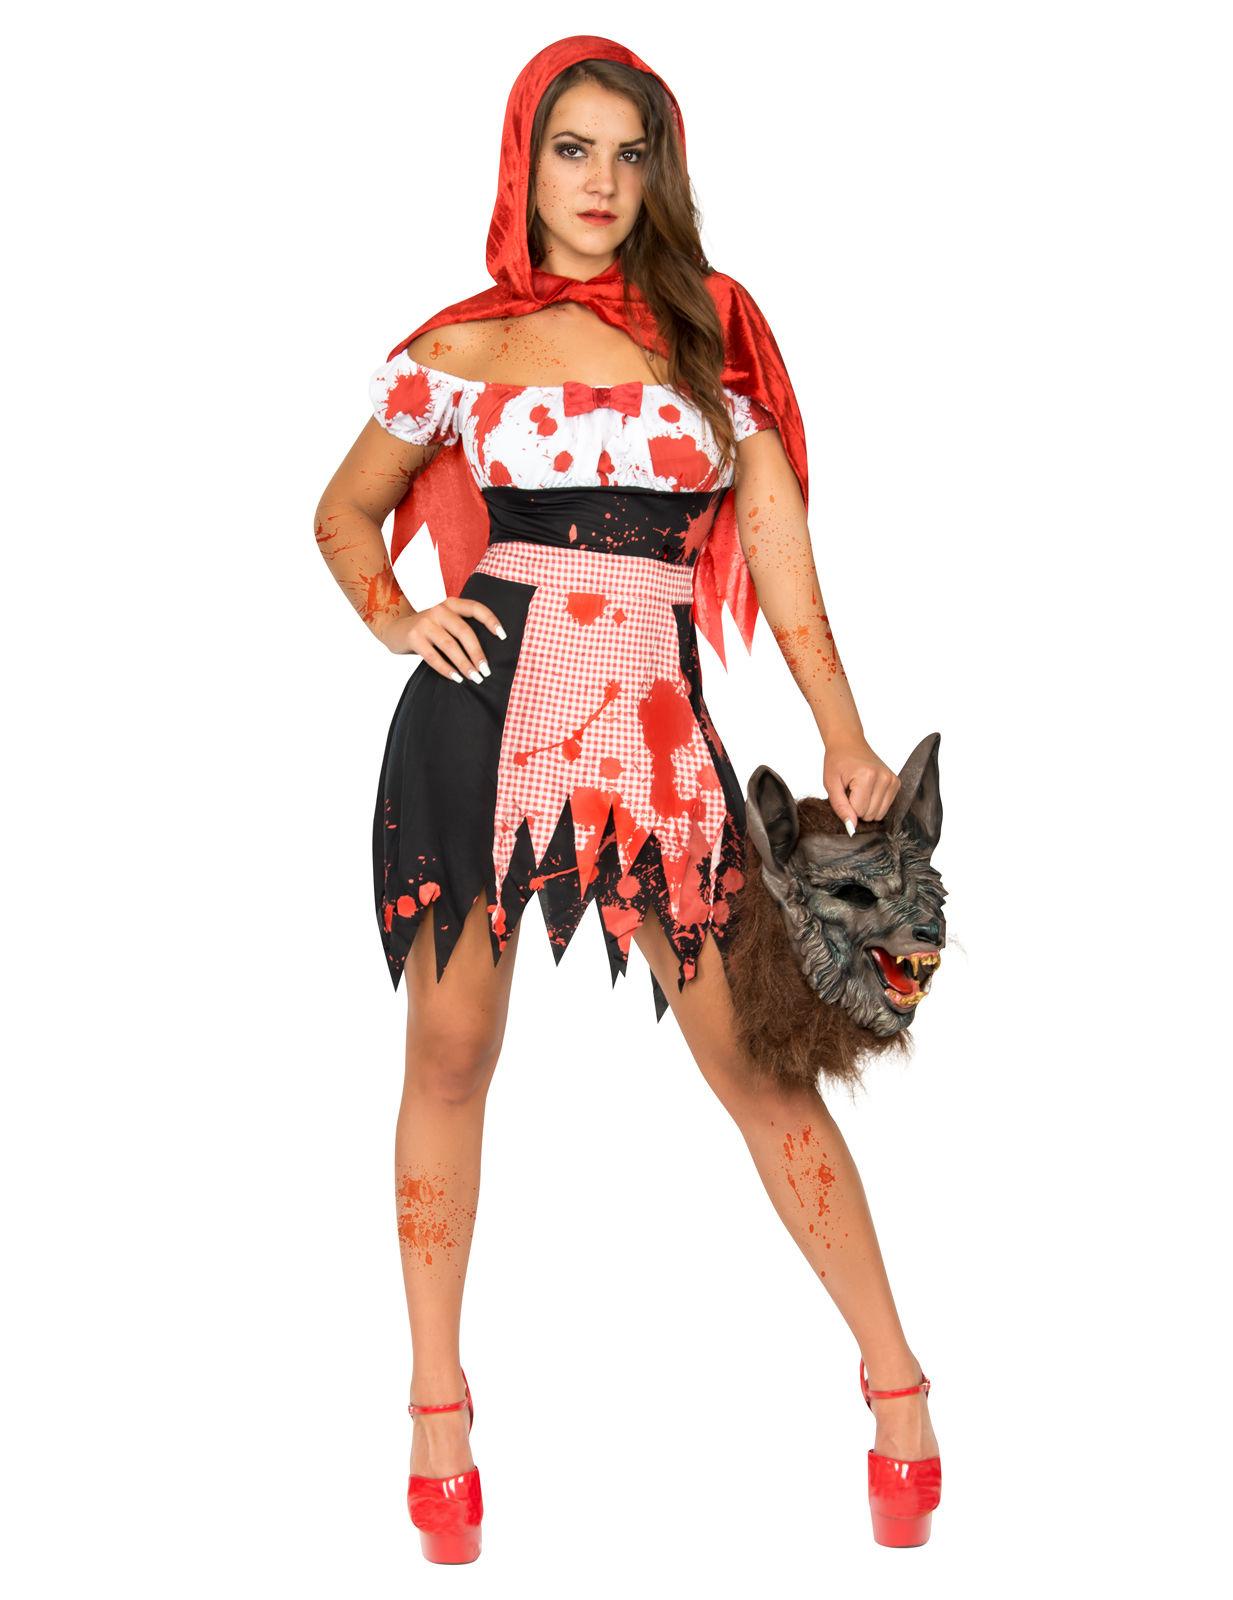 ef3cfd1159baa1 Zombie-Rotkäppchen Halloween-Damenkostüm rot-weiss-schwarz